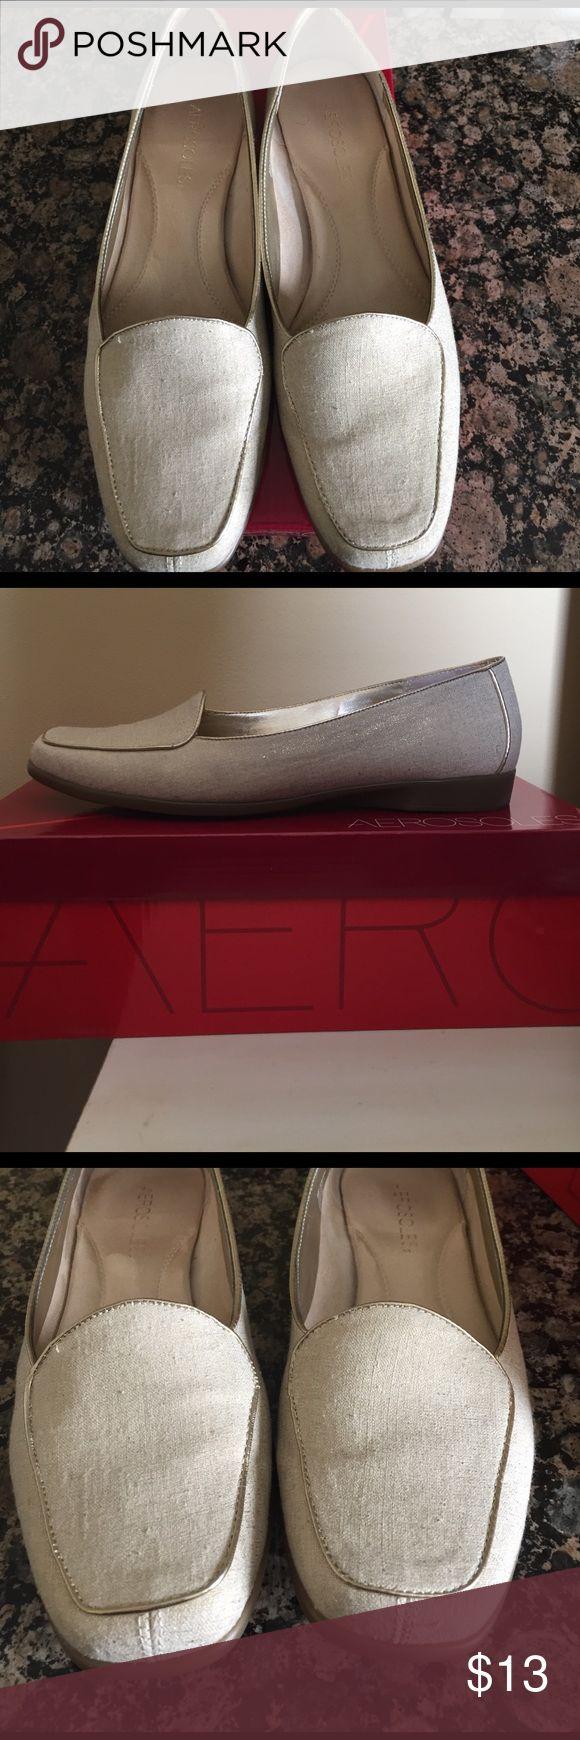 Aerosoles loafer Cute Aerosole loafers with gold flex and trim. EUC worn a few times. Smoke free and pet free home. AEROSOLES Shoes Flats & Loafers